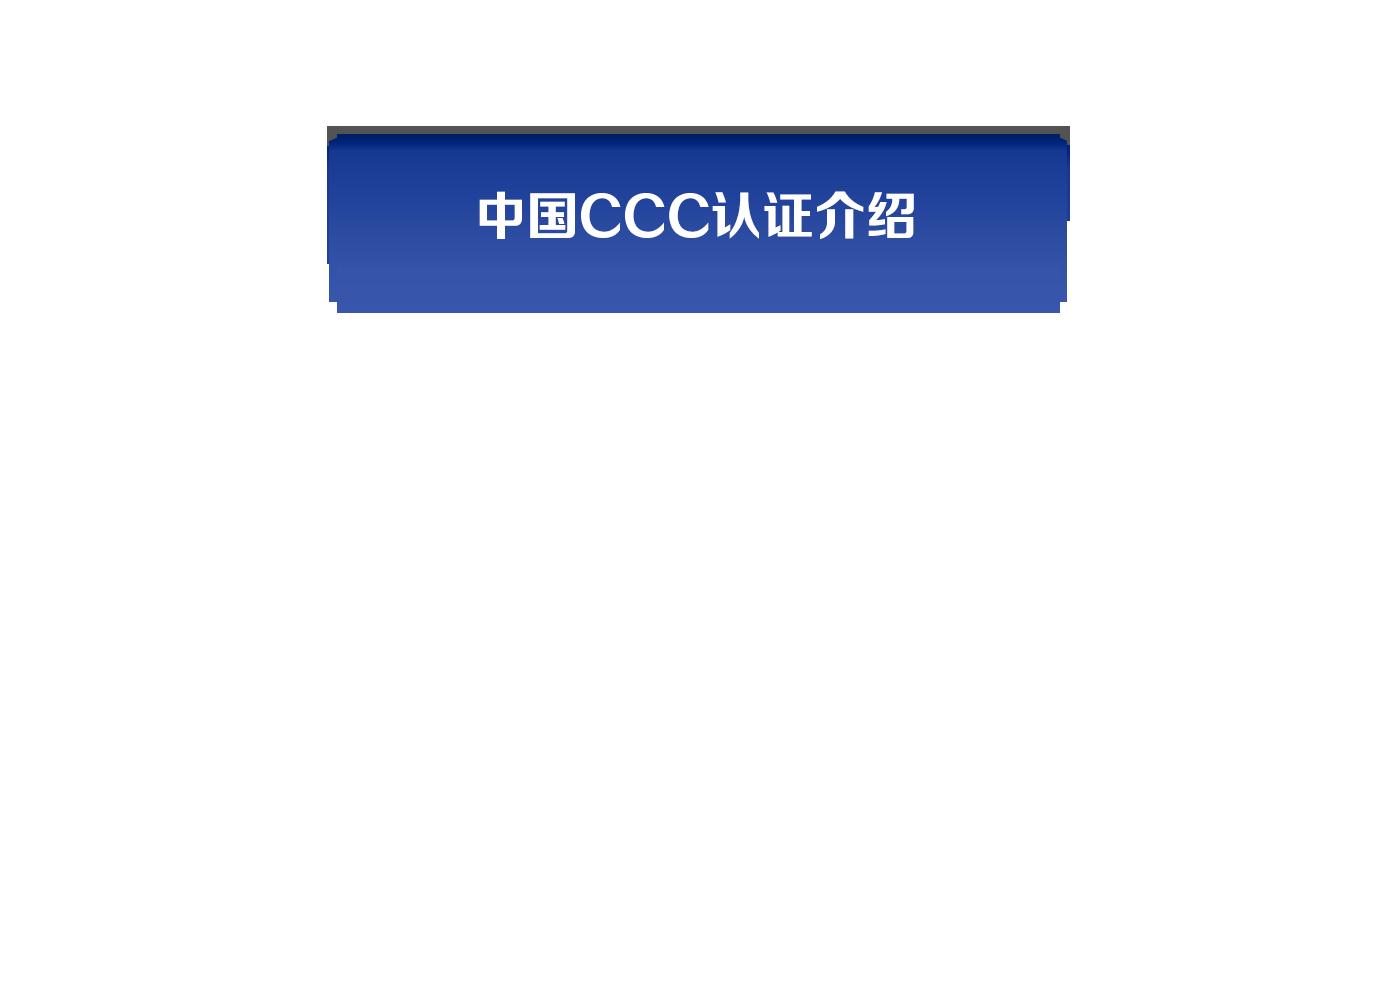 ABUIABAEGAAg-uaNzgUowP7B-gMw_Ao46Ac